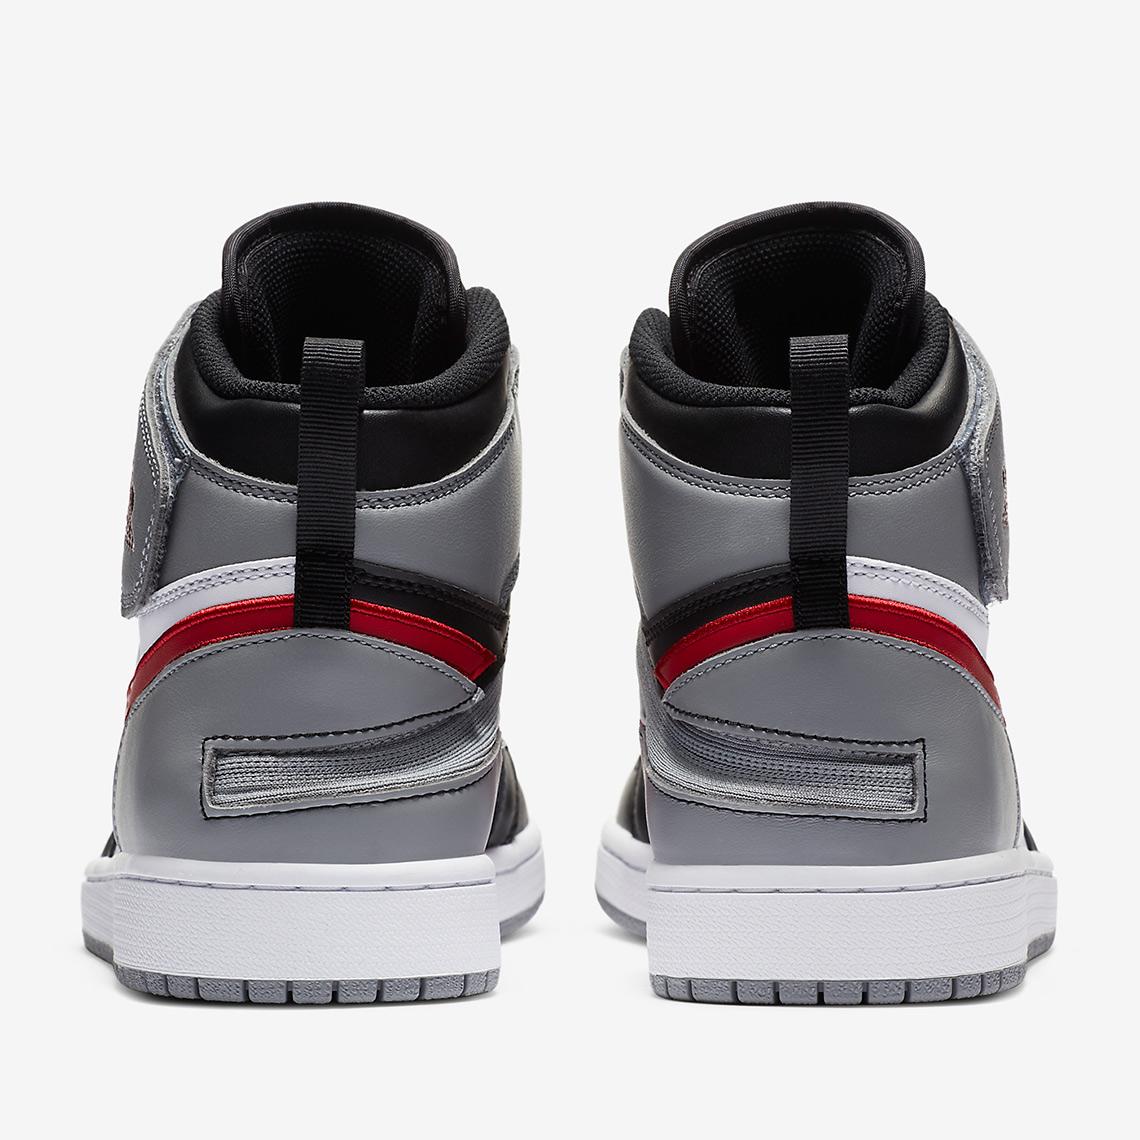 Air Jordan 1 FlyEase To Receive New Colorway: Photos